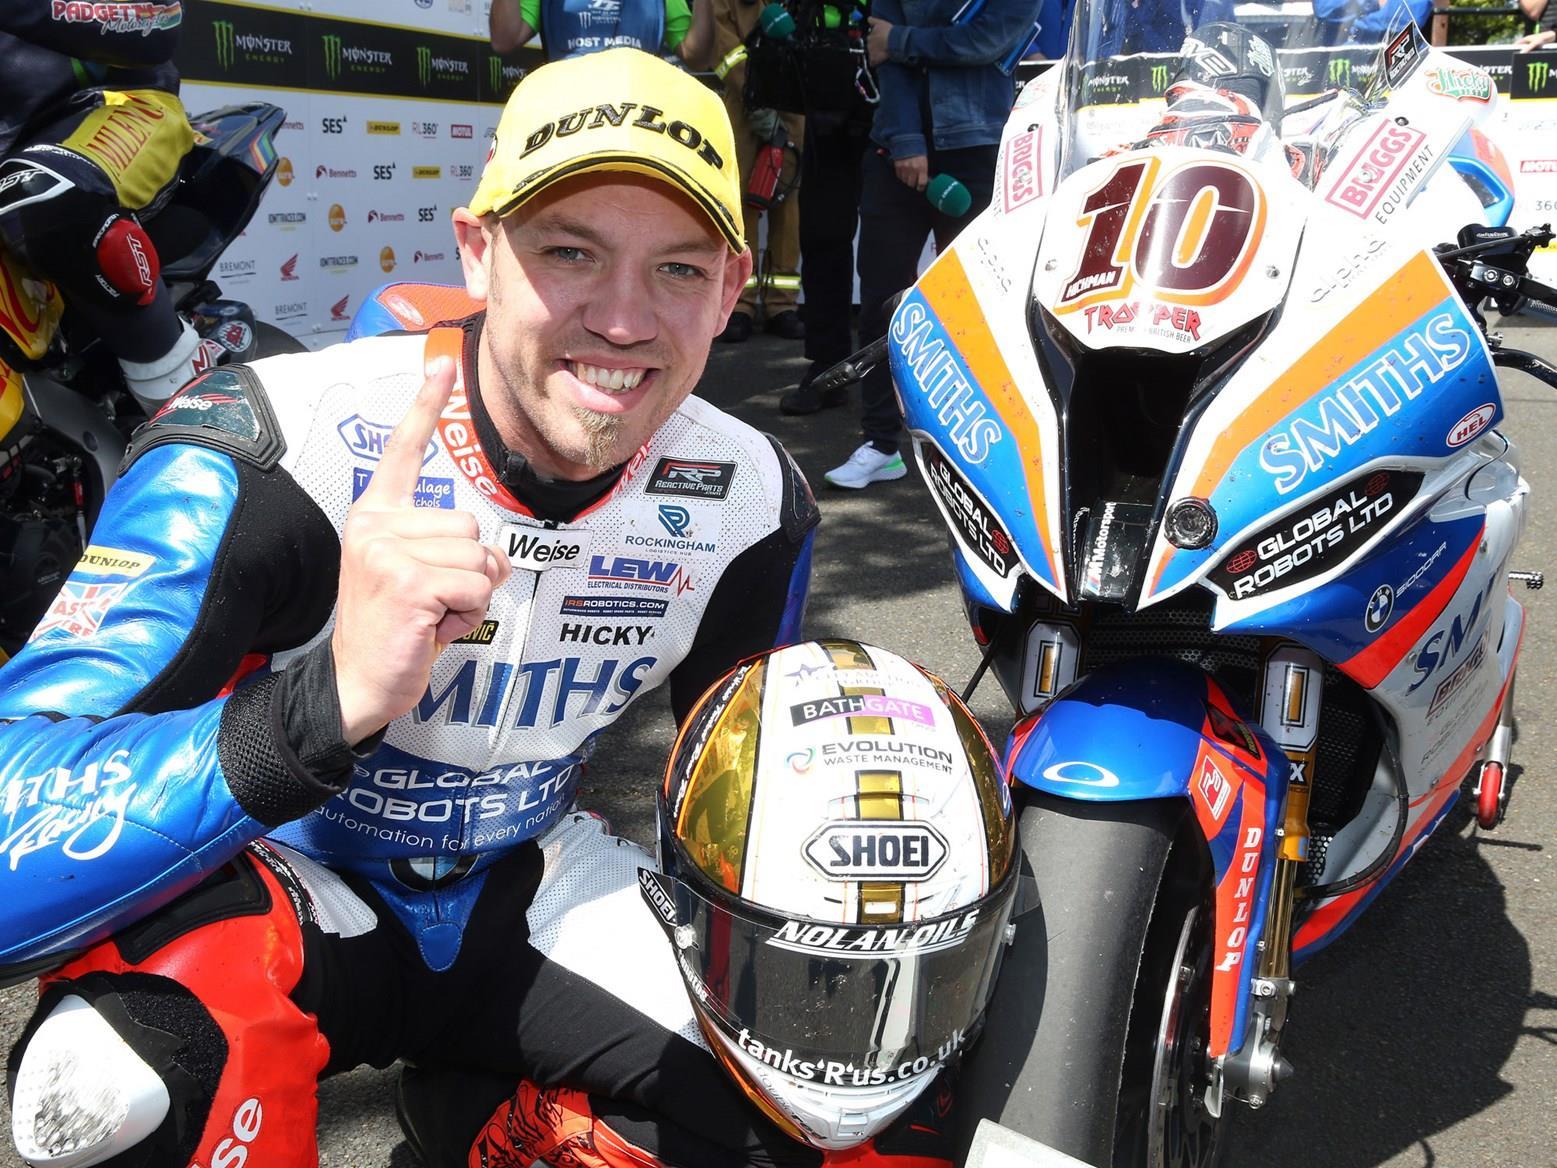 Hickman celebrates success at the 2019 Isle of Man TT